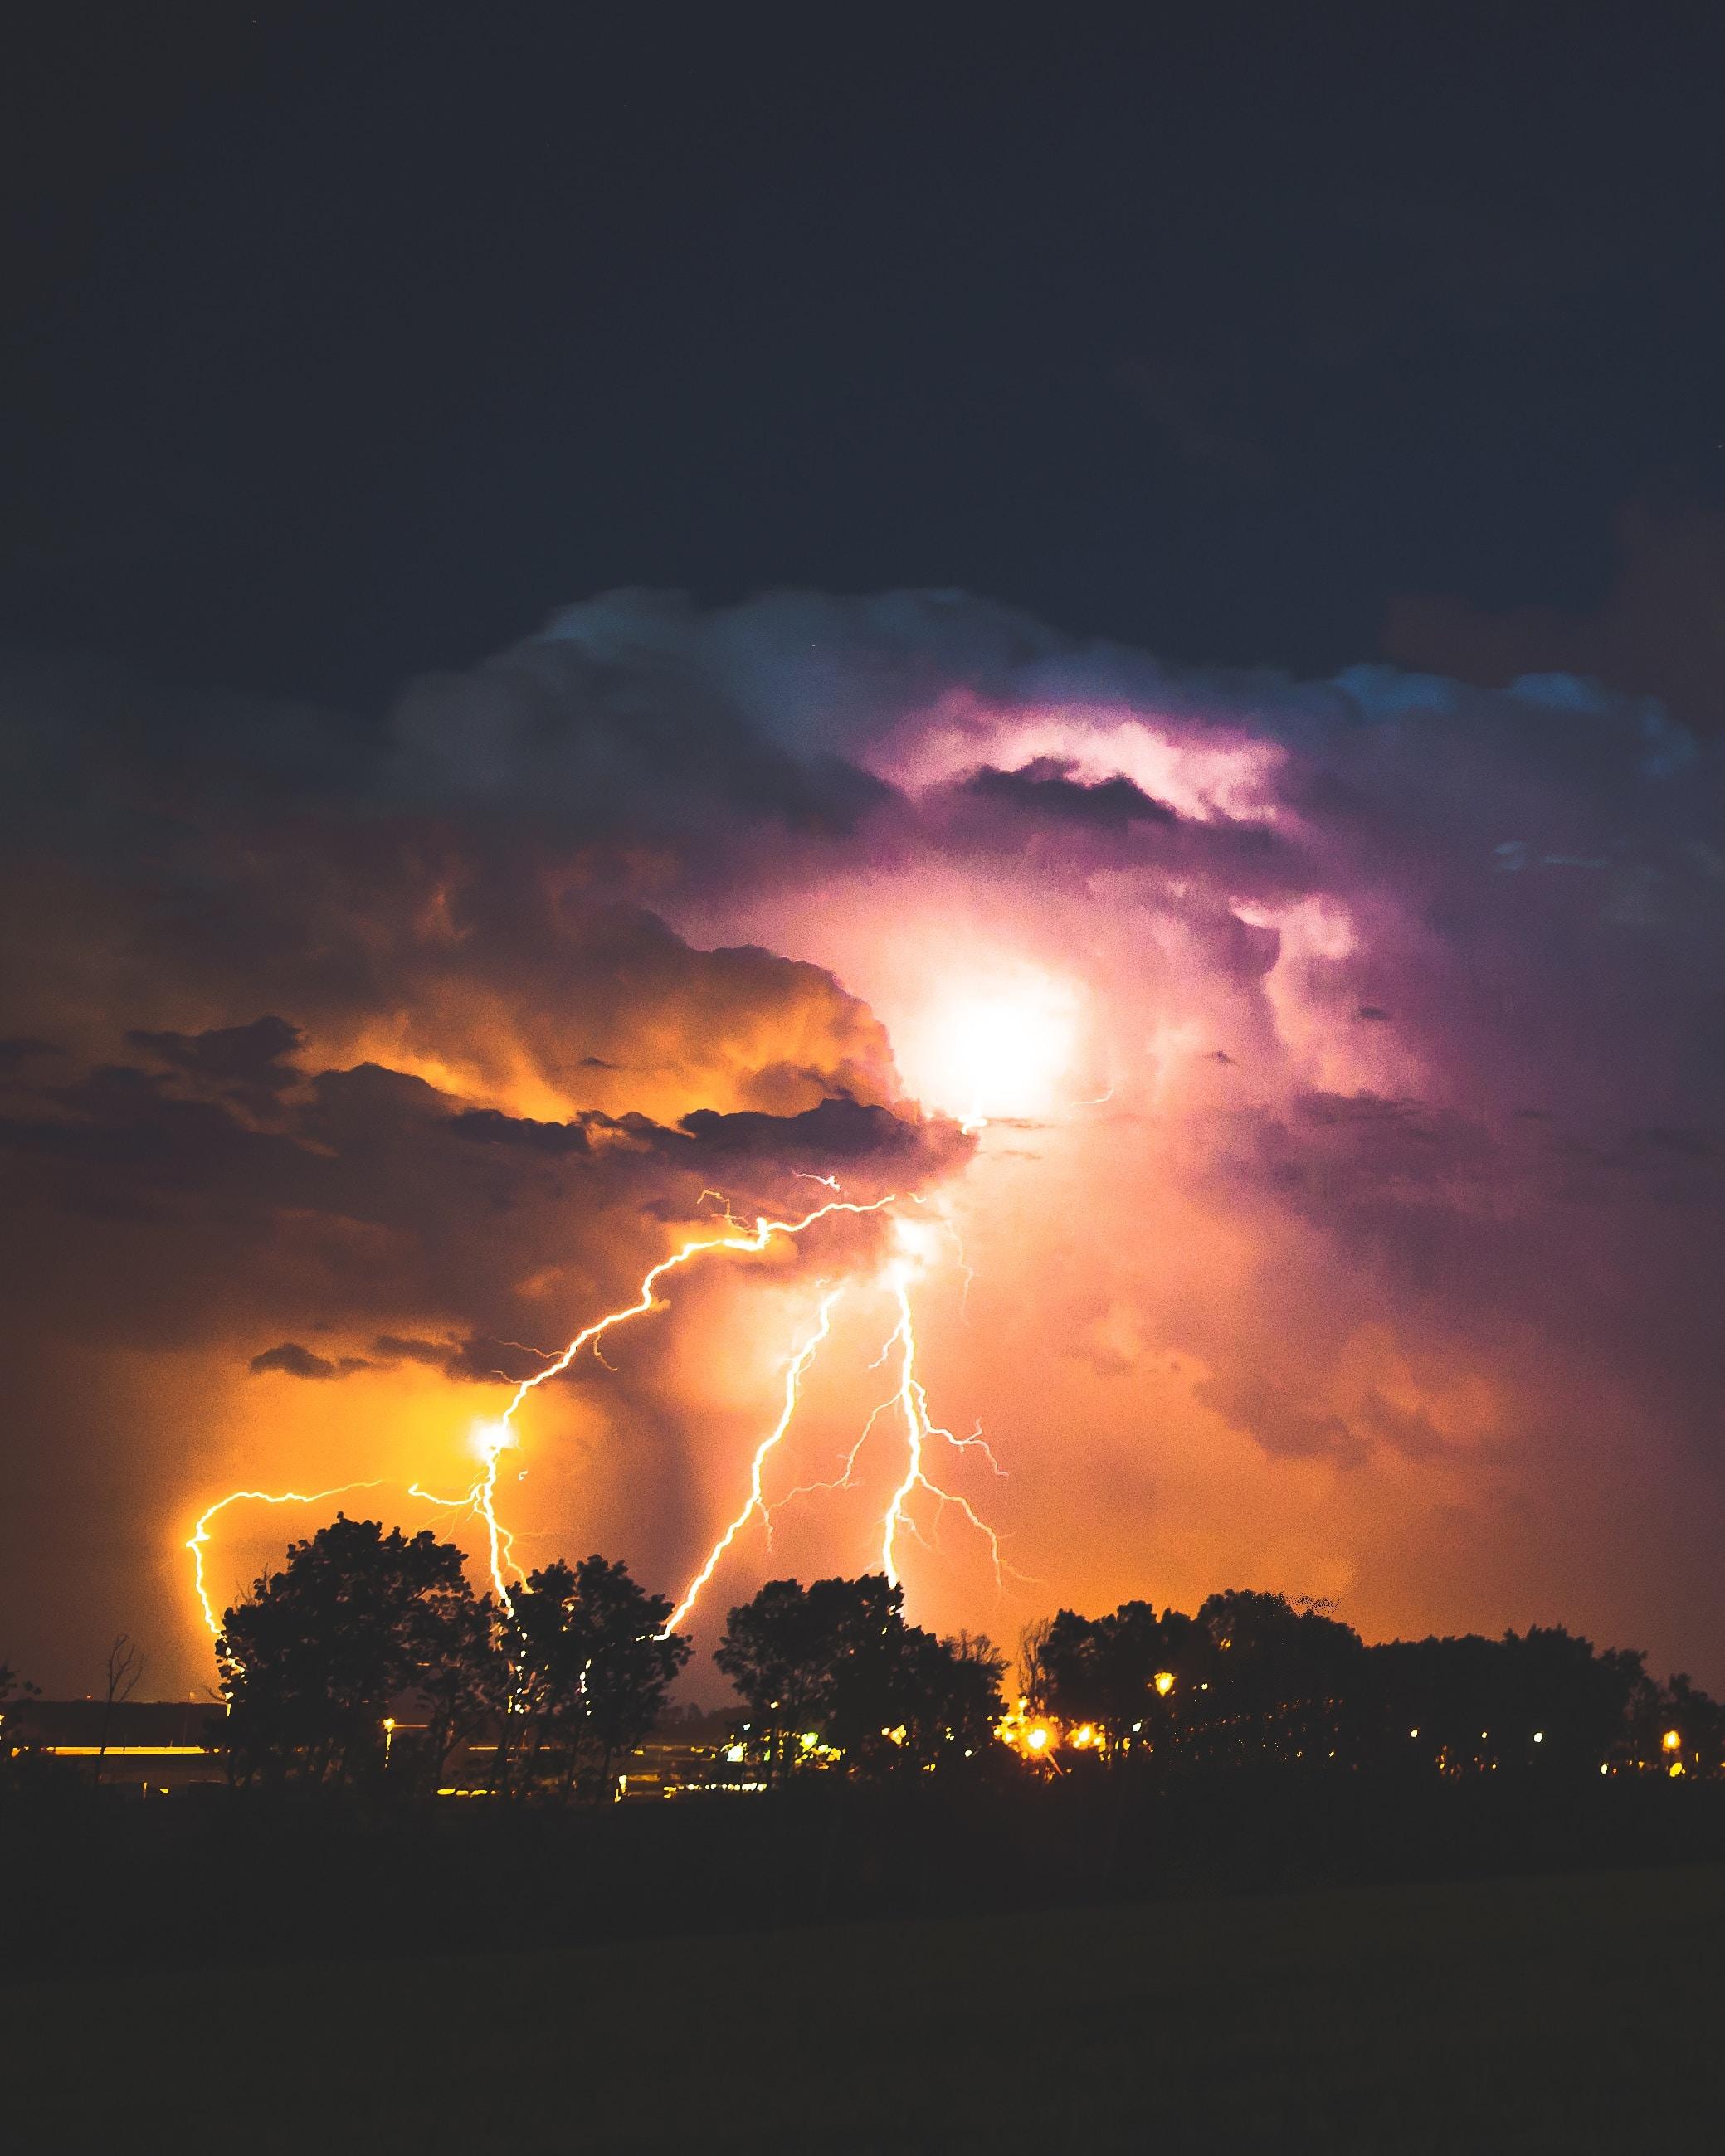 lightning strike at night